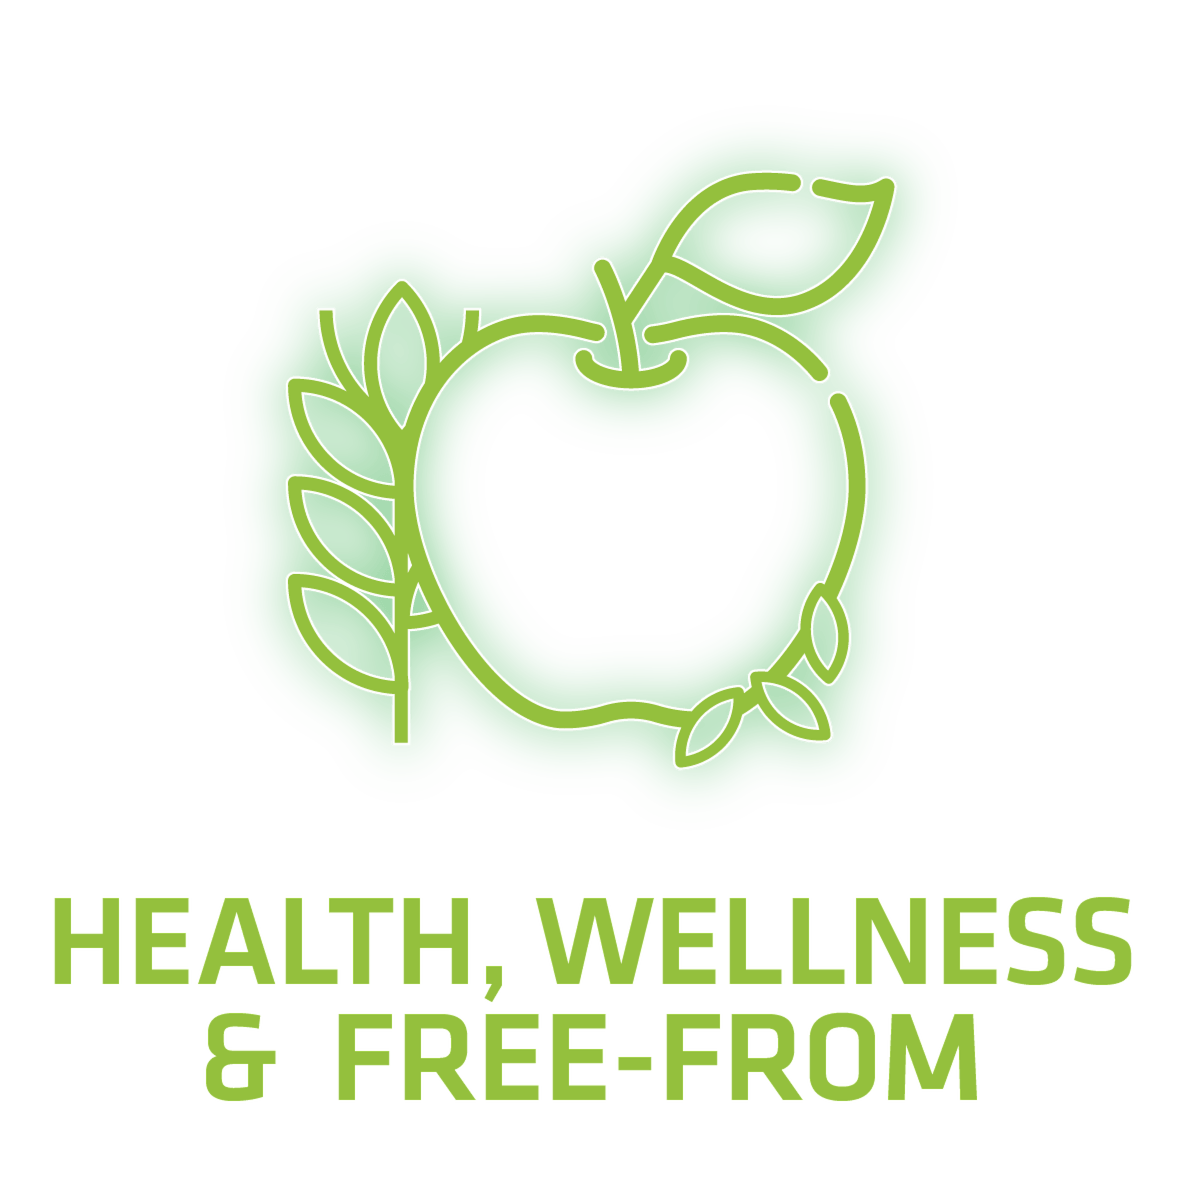 Gulfood health and wellness